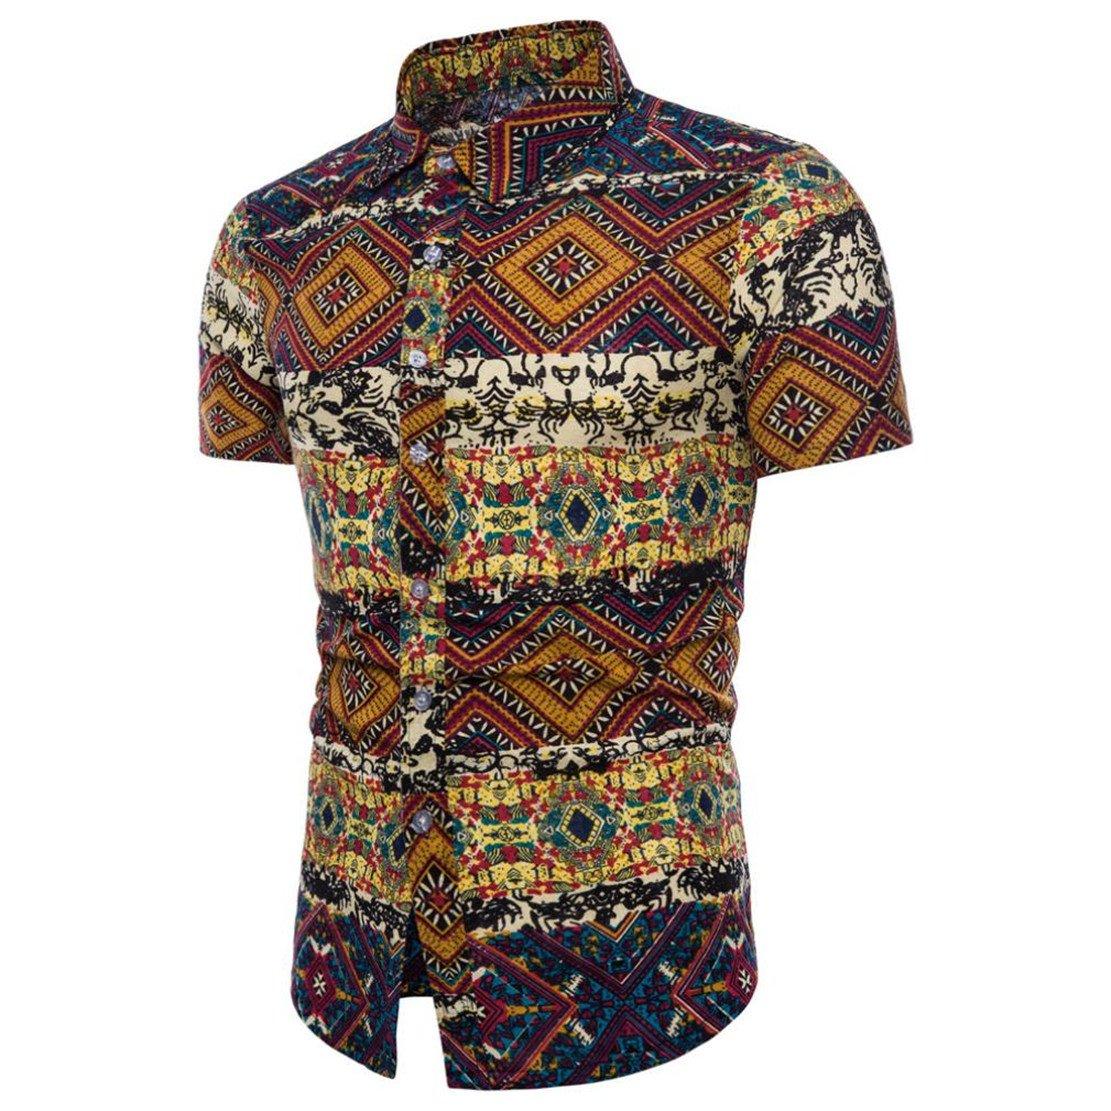 Doric Mens Summer Boho Floral Short Sleeve Hawaii Shirt Tops